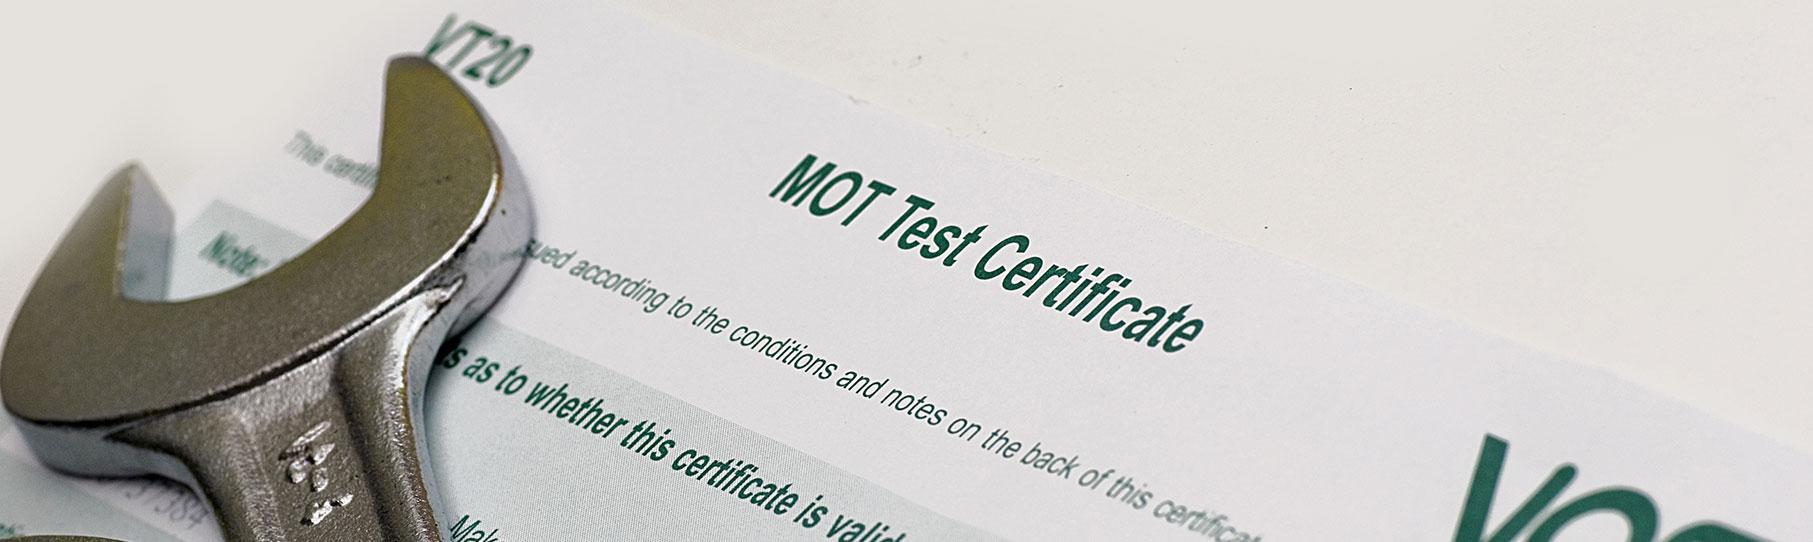 Do I Need To Keep My Mot Certificate Titan Hull